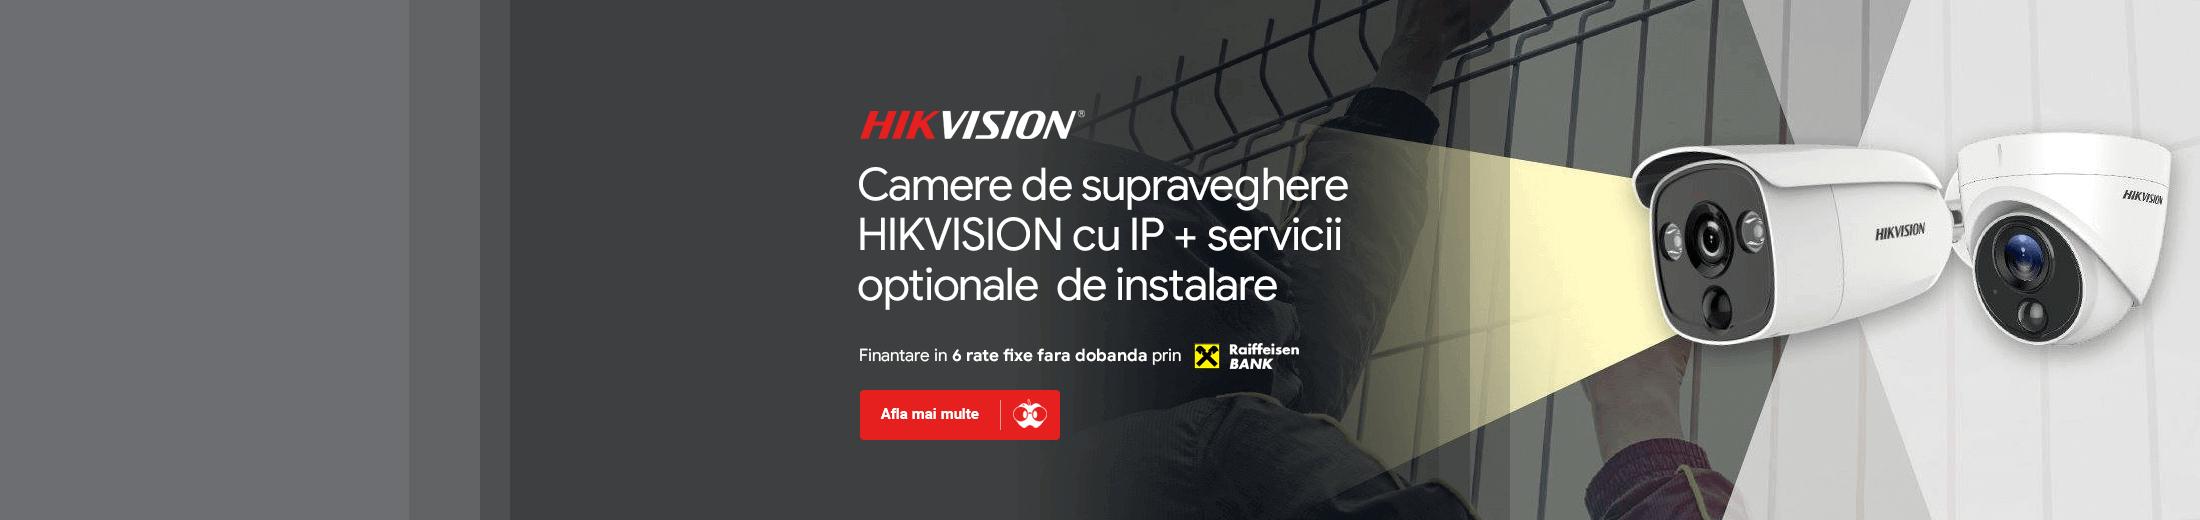 Camere de supraveghere Hikvision